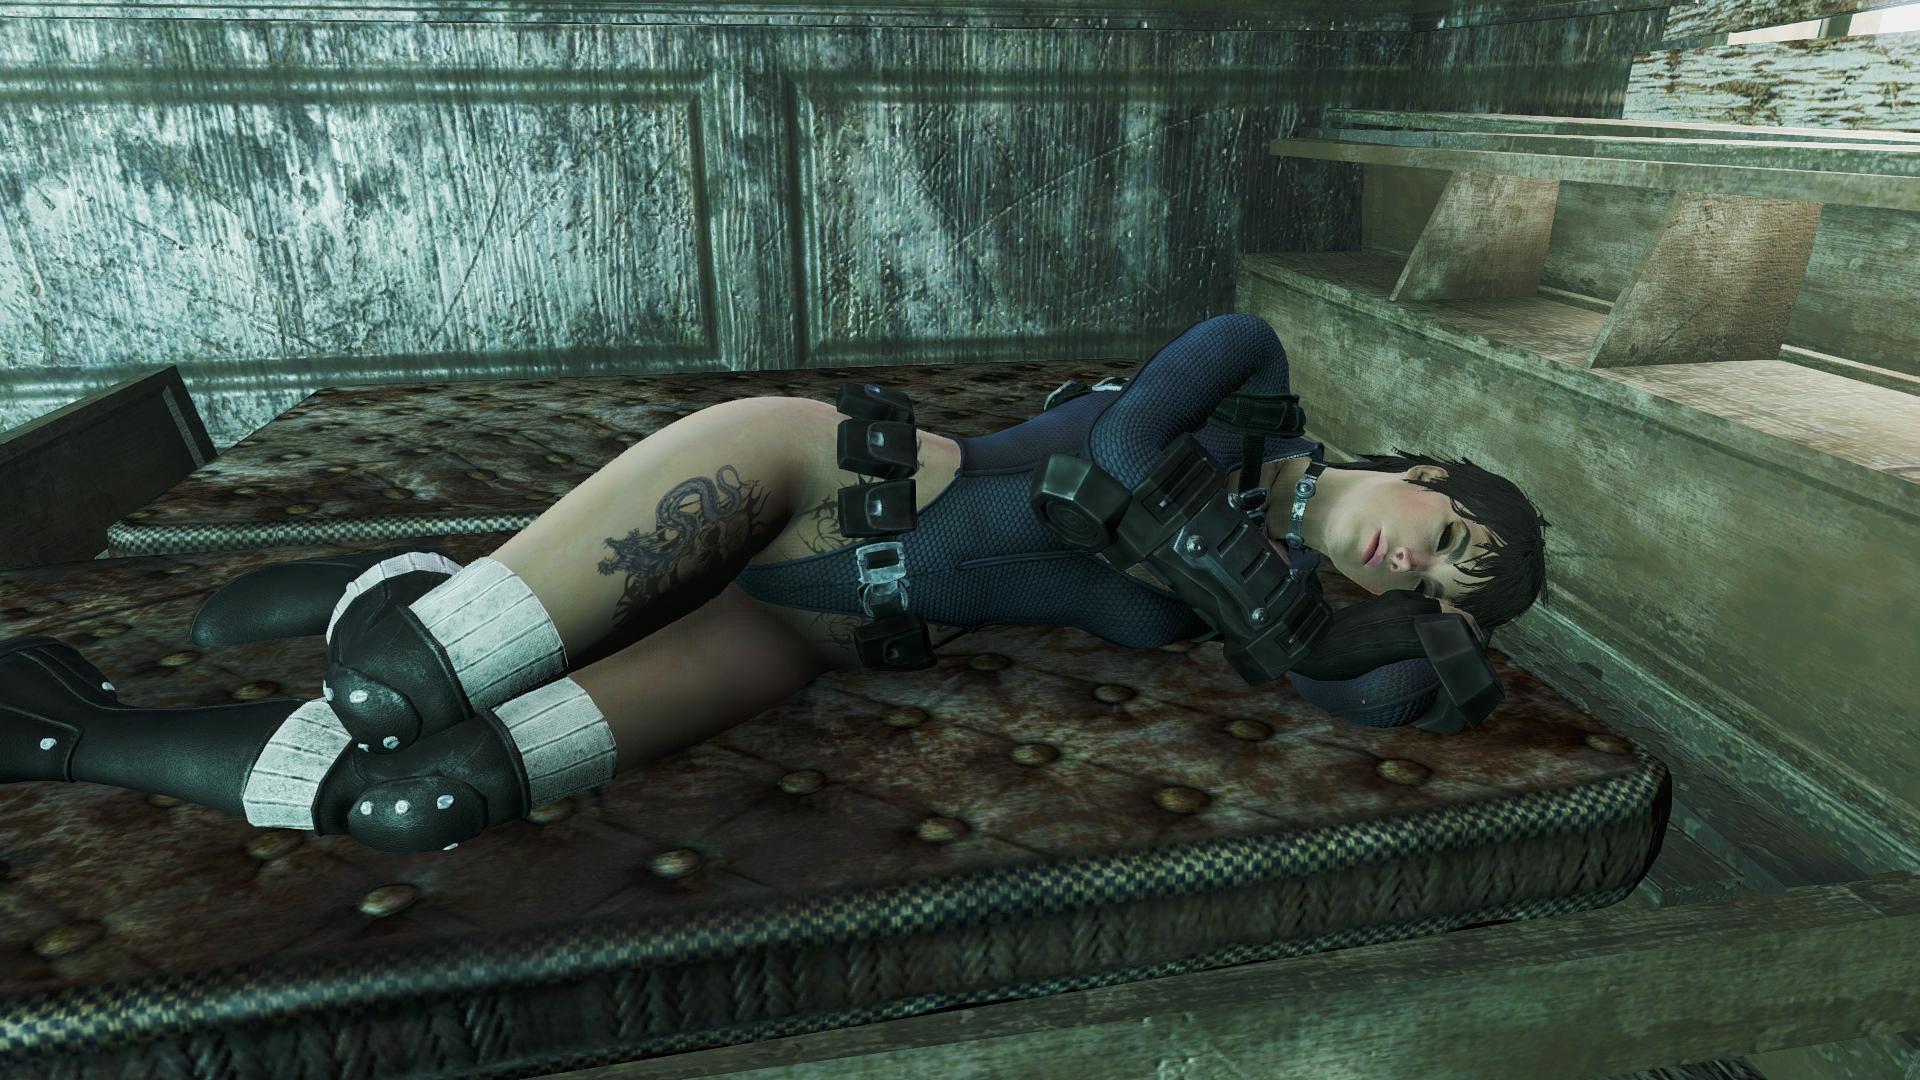 000595.Jpg - Fallout 4